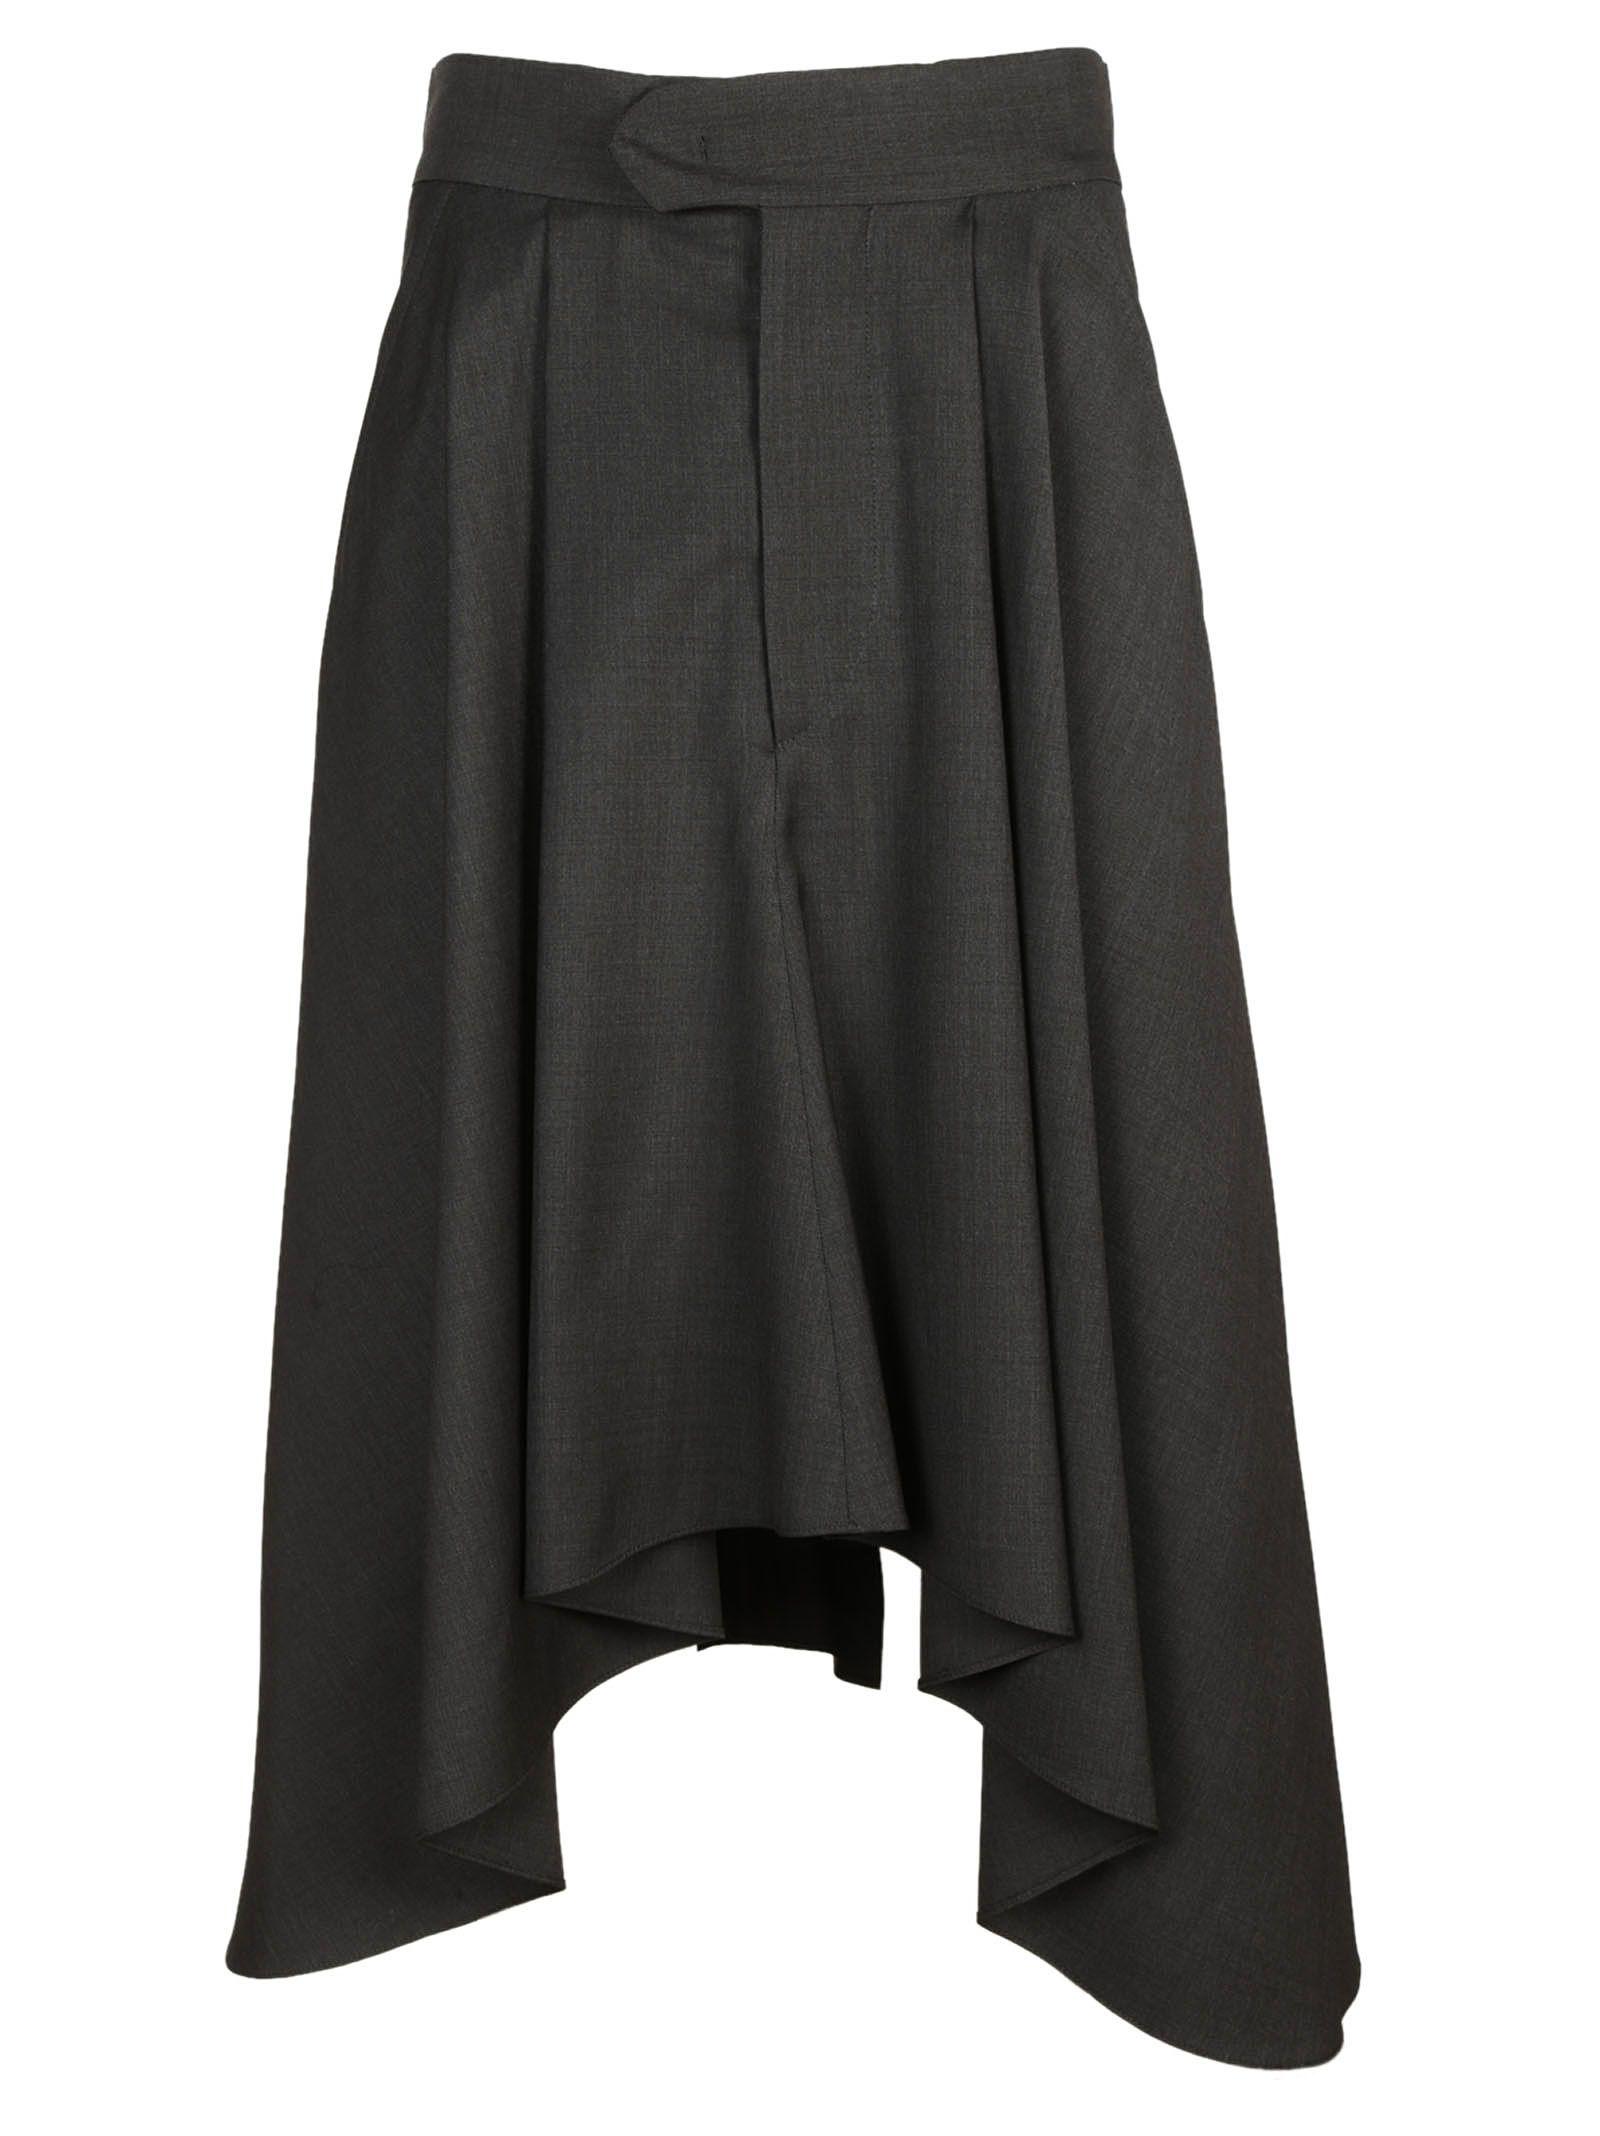 Isabel Marant Asymmetrical Skirt